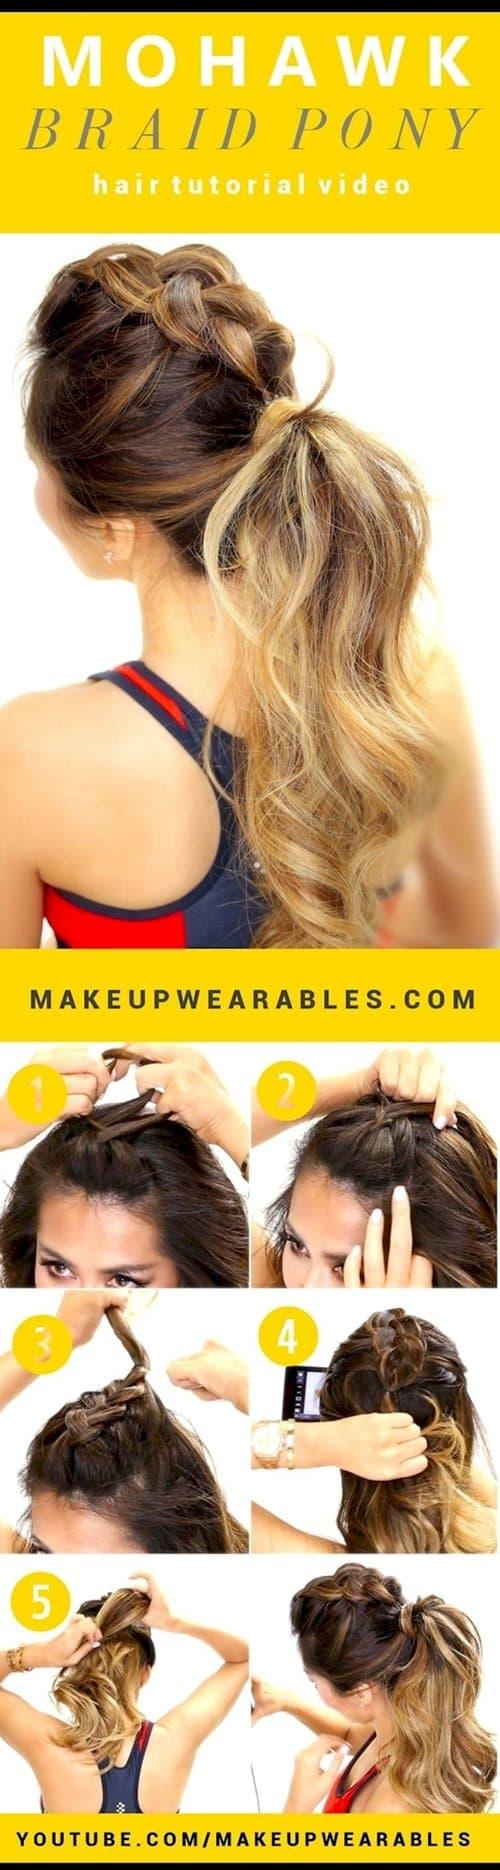 ponytails-mohawk